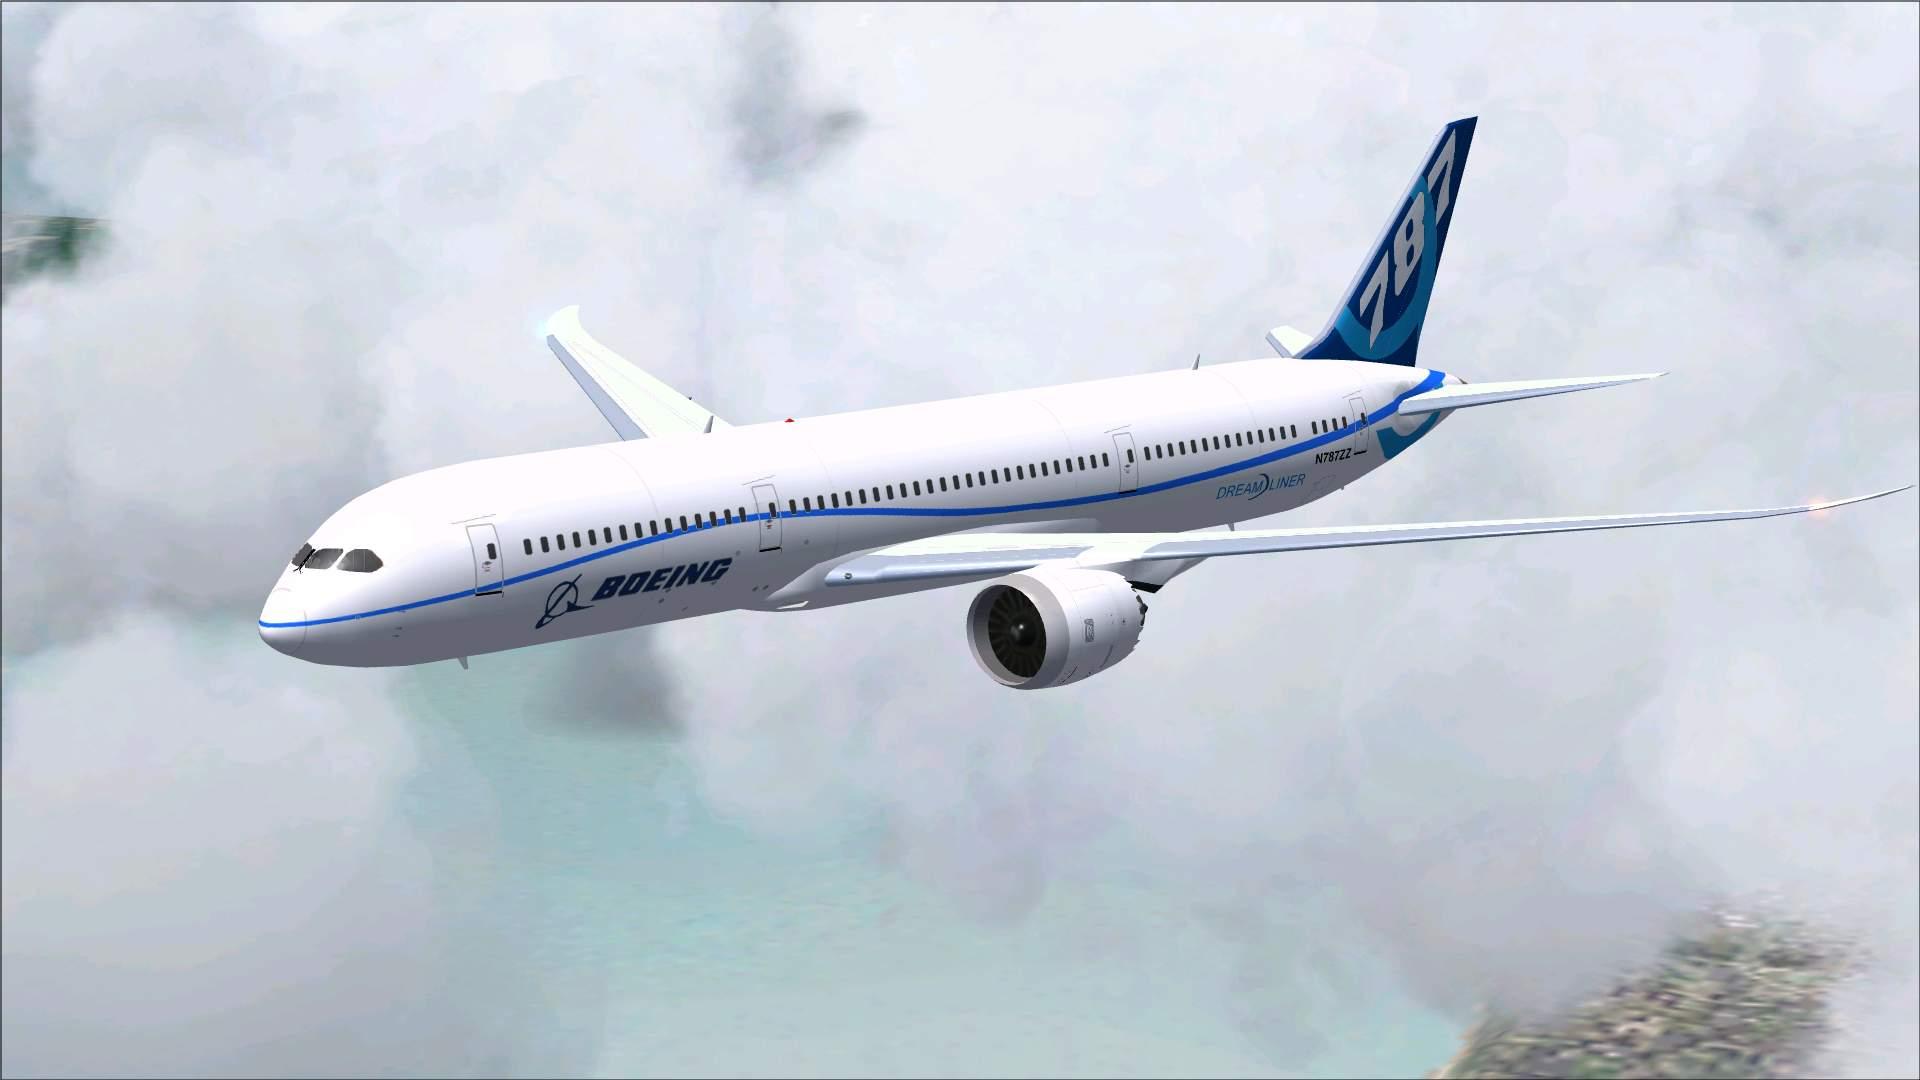 Flight Sim Screen Shots